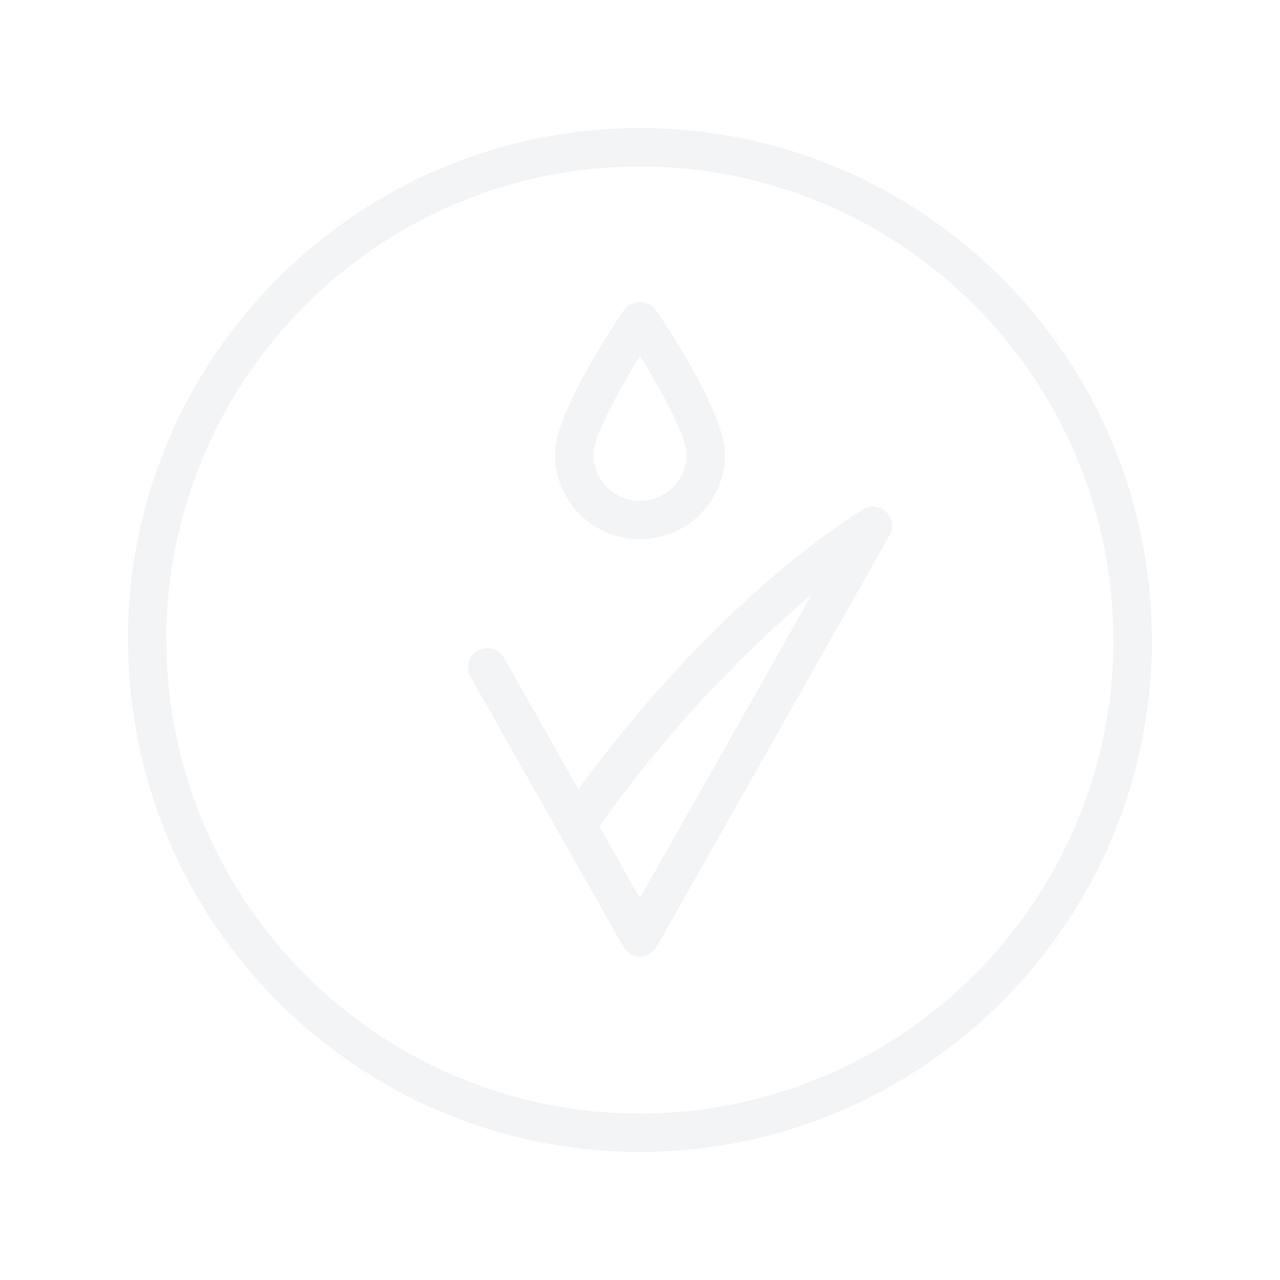 Ingli Pai Mud Mask For Sensitive or Acne-Prone Skin 30ml